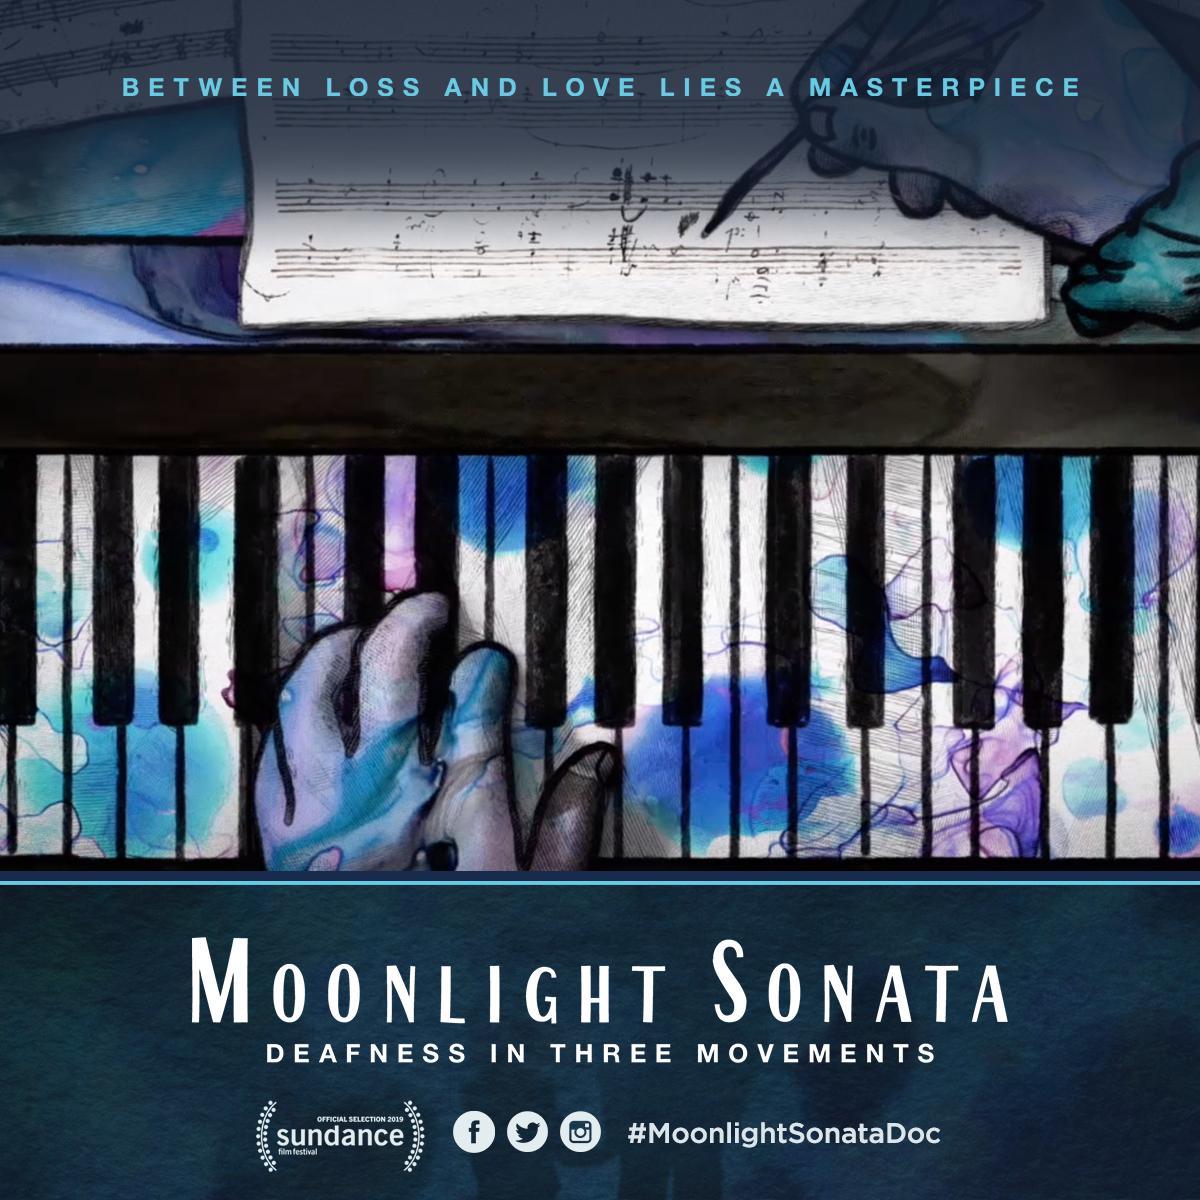 MoonlightSonata_1200x1200_4.png